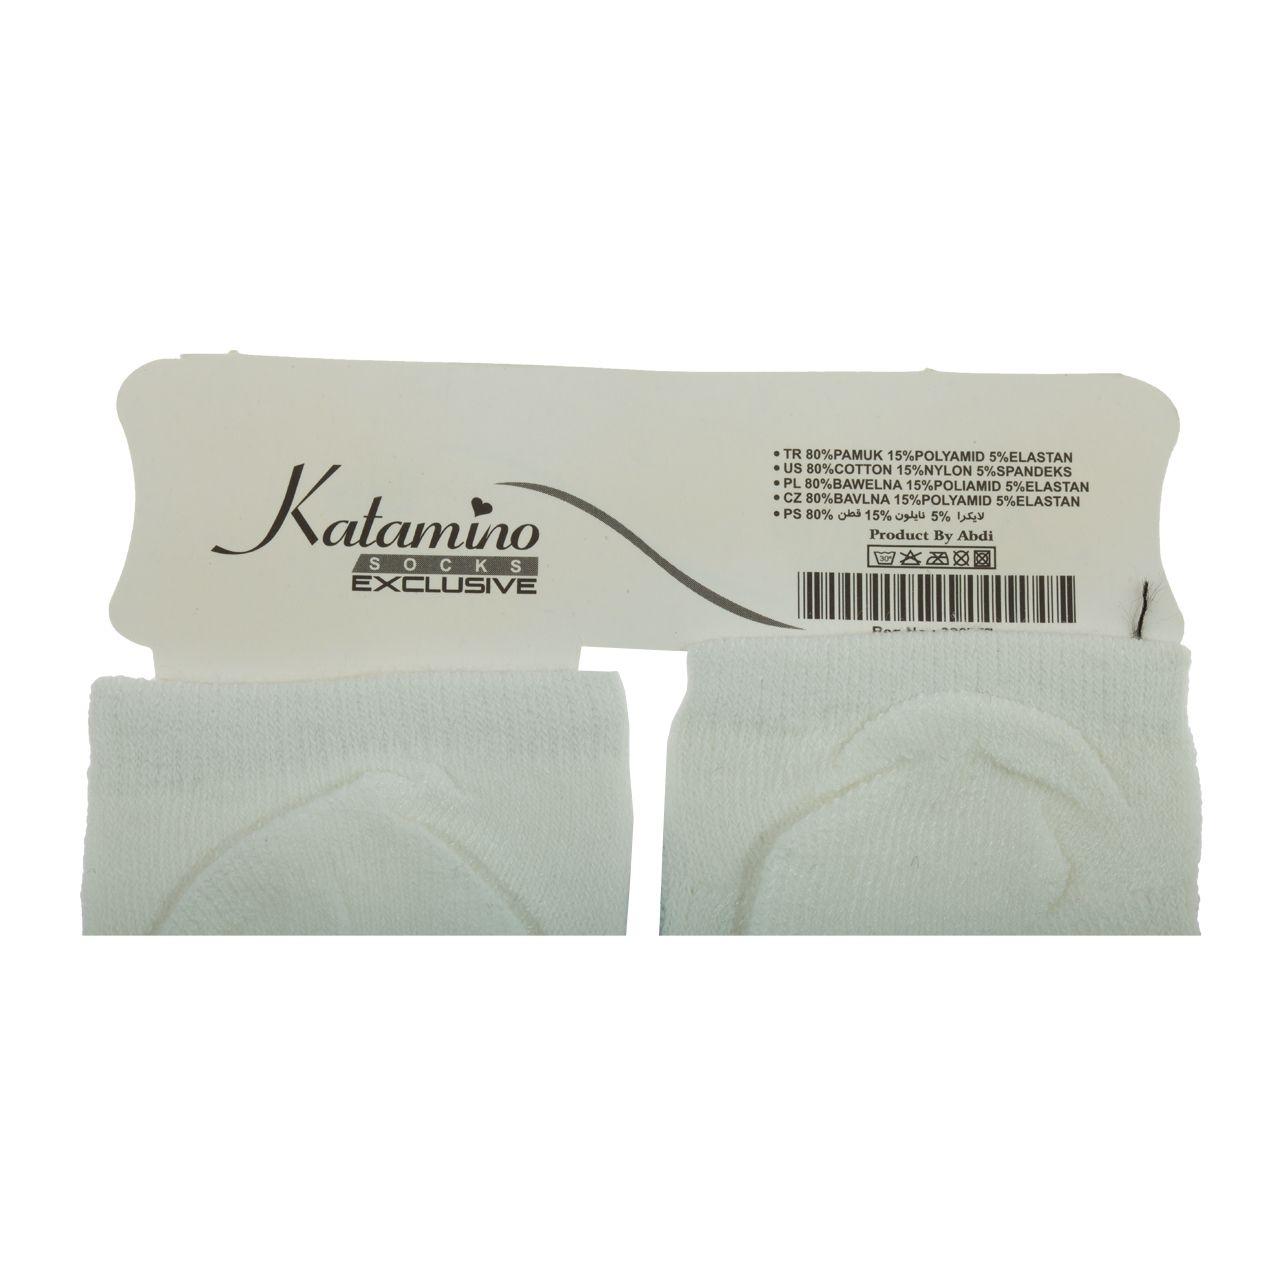 جوراب نوزاد کاتامینو طرح دختر مهربون  -  - 2